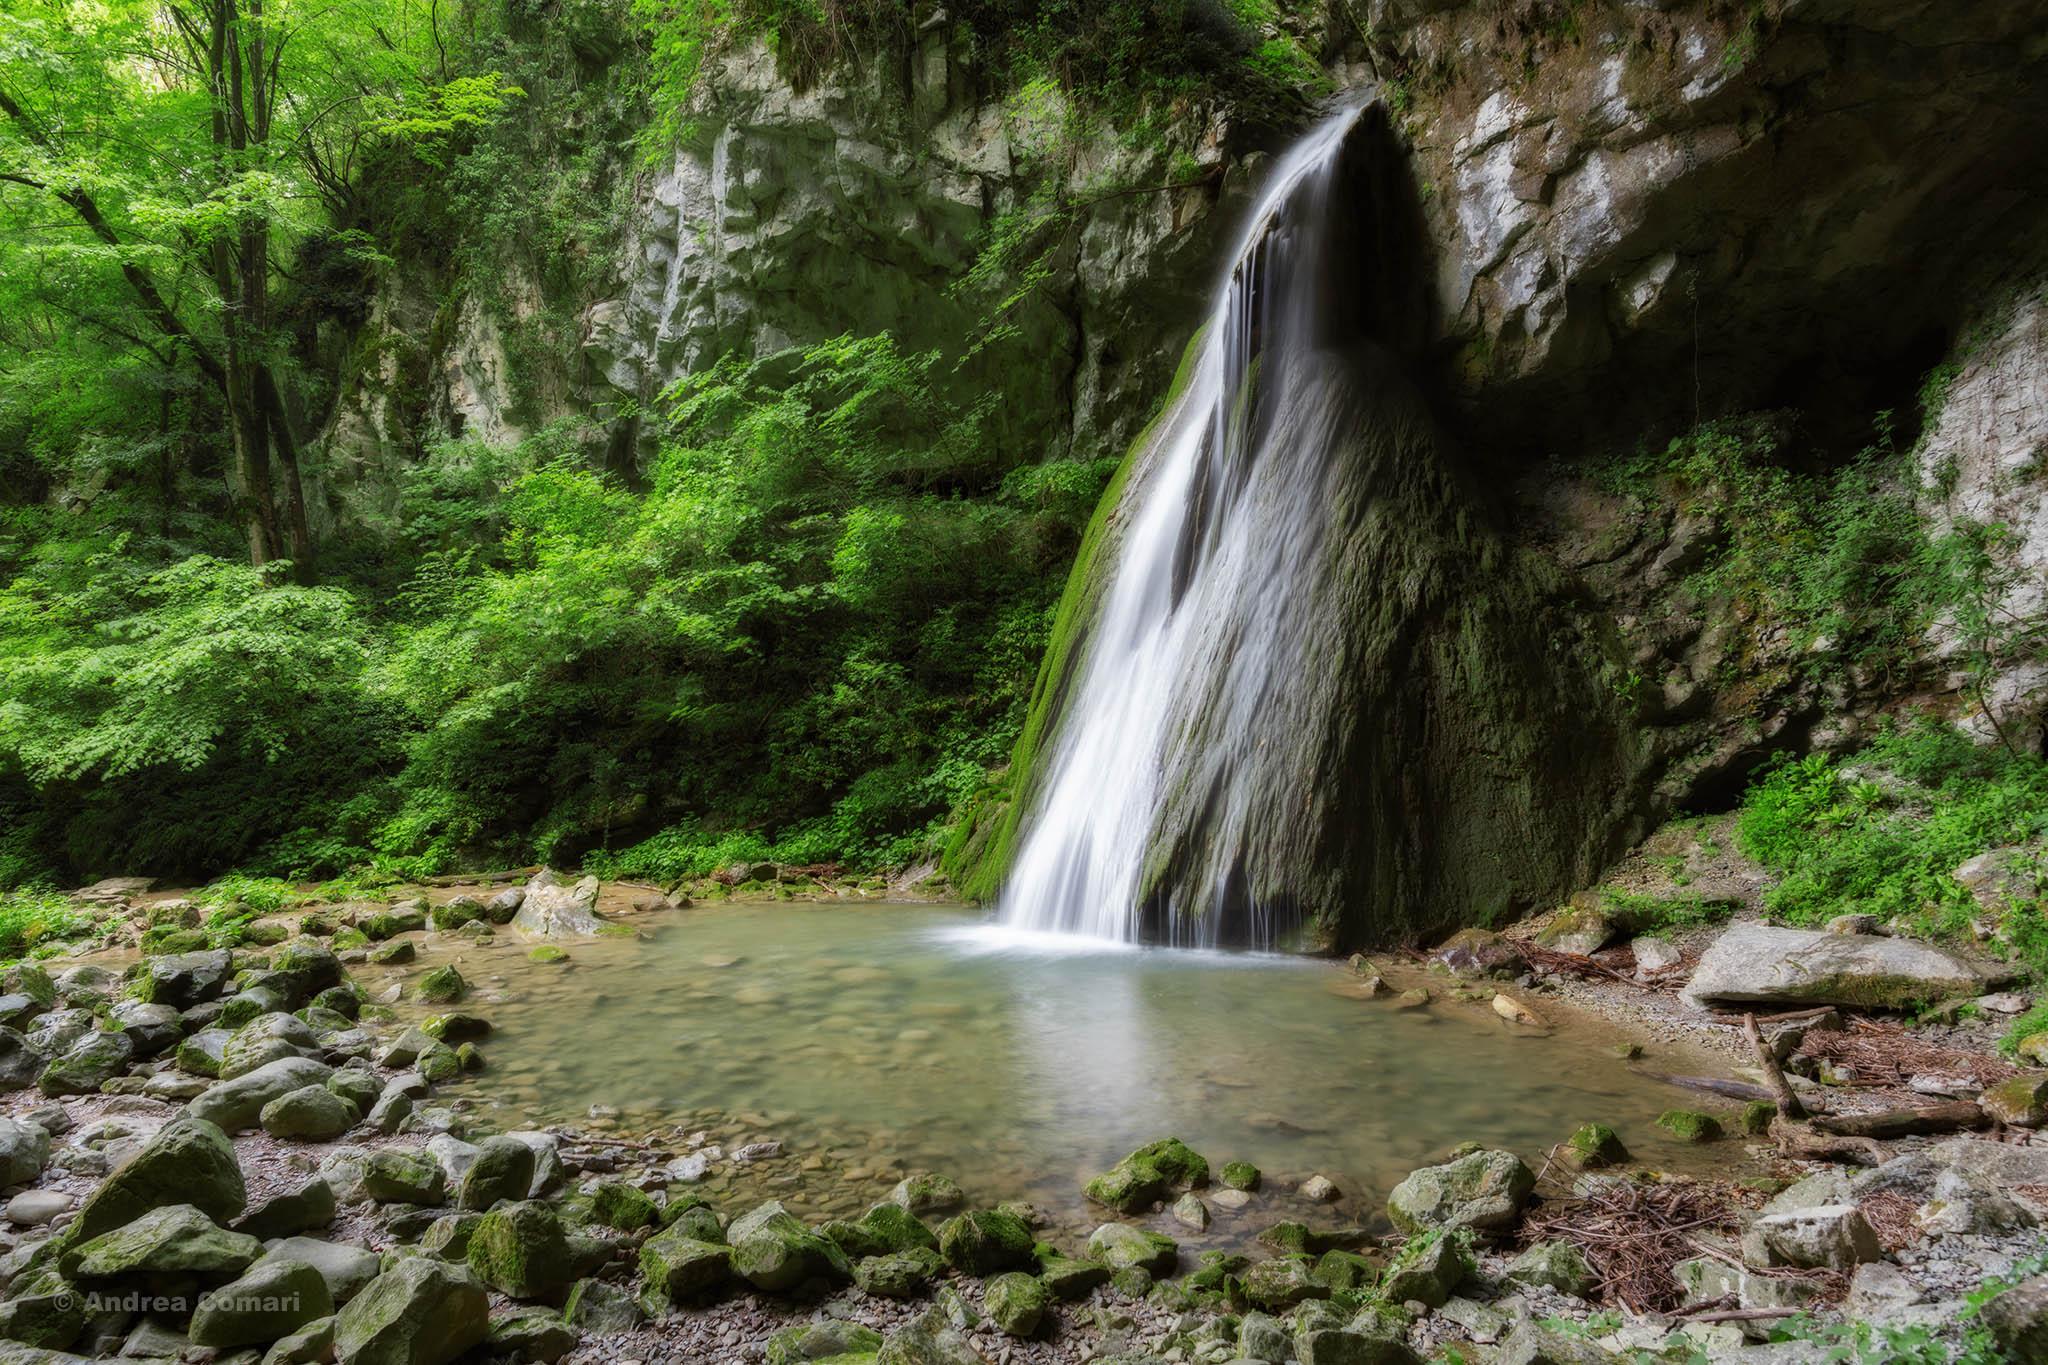 Kot Waterfalls, Italy